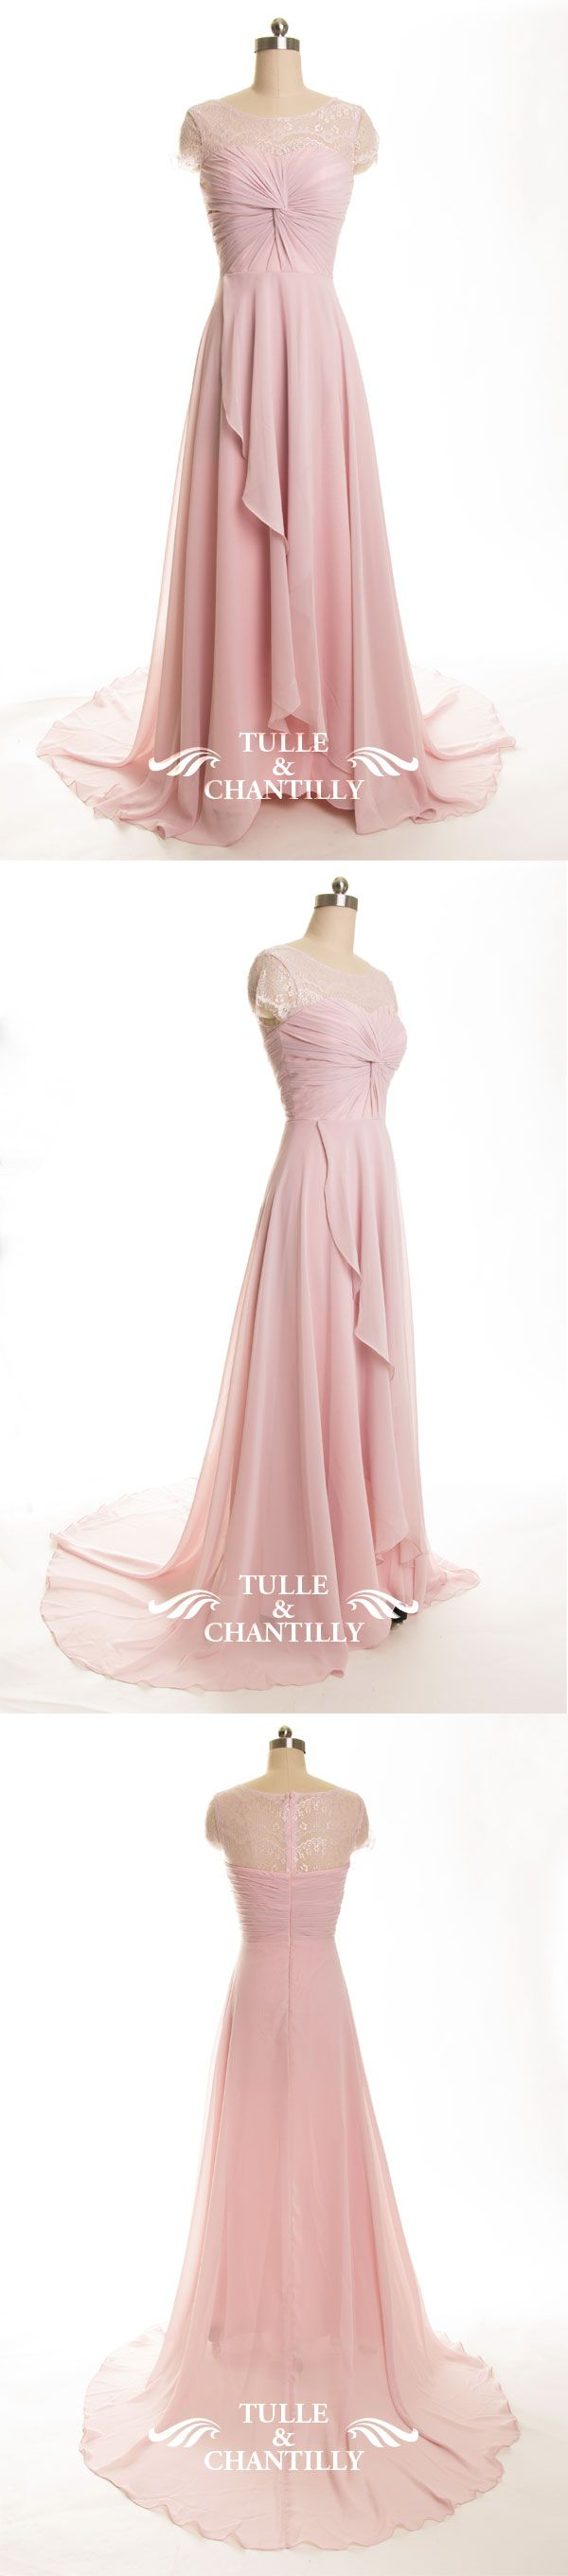 lavender blush long lace and chiffon bridesmaid dress 2015